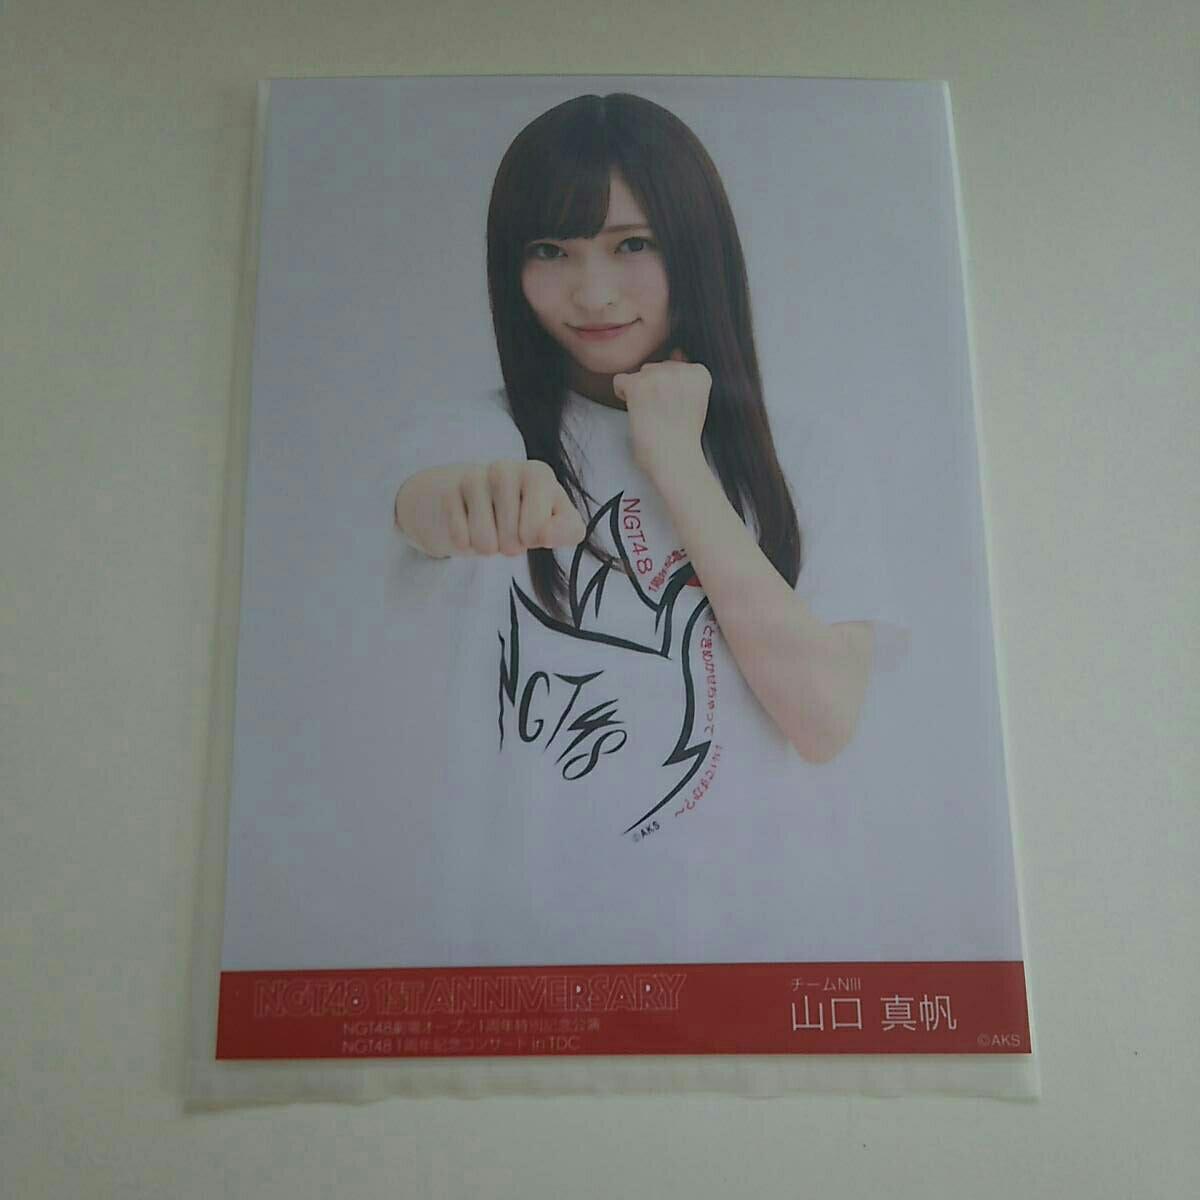 NGT48 山口真帆 1ST ANNIVERSARY DVD/BD 封入 生写真 ライブグッズの画像